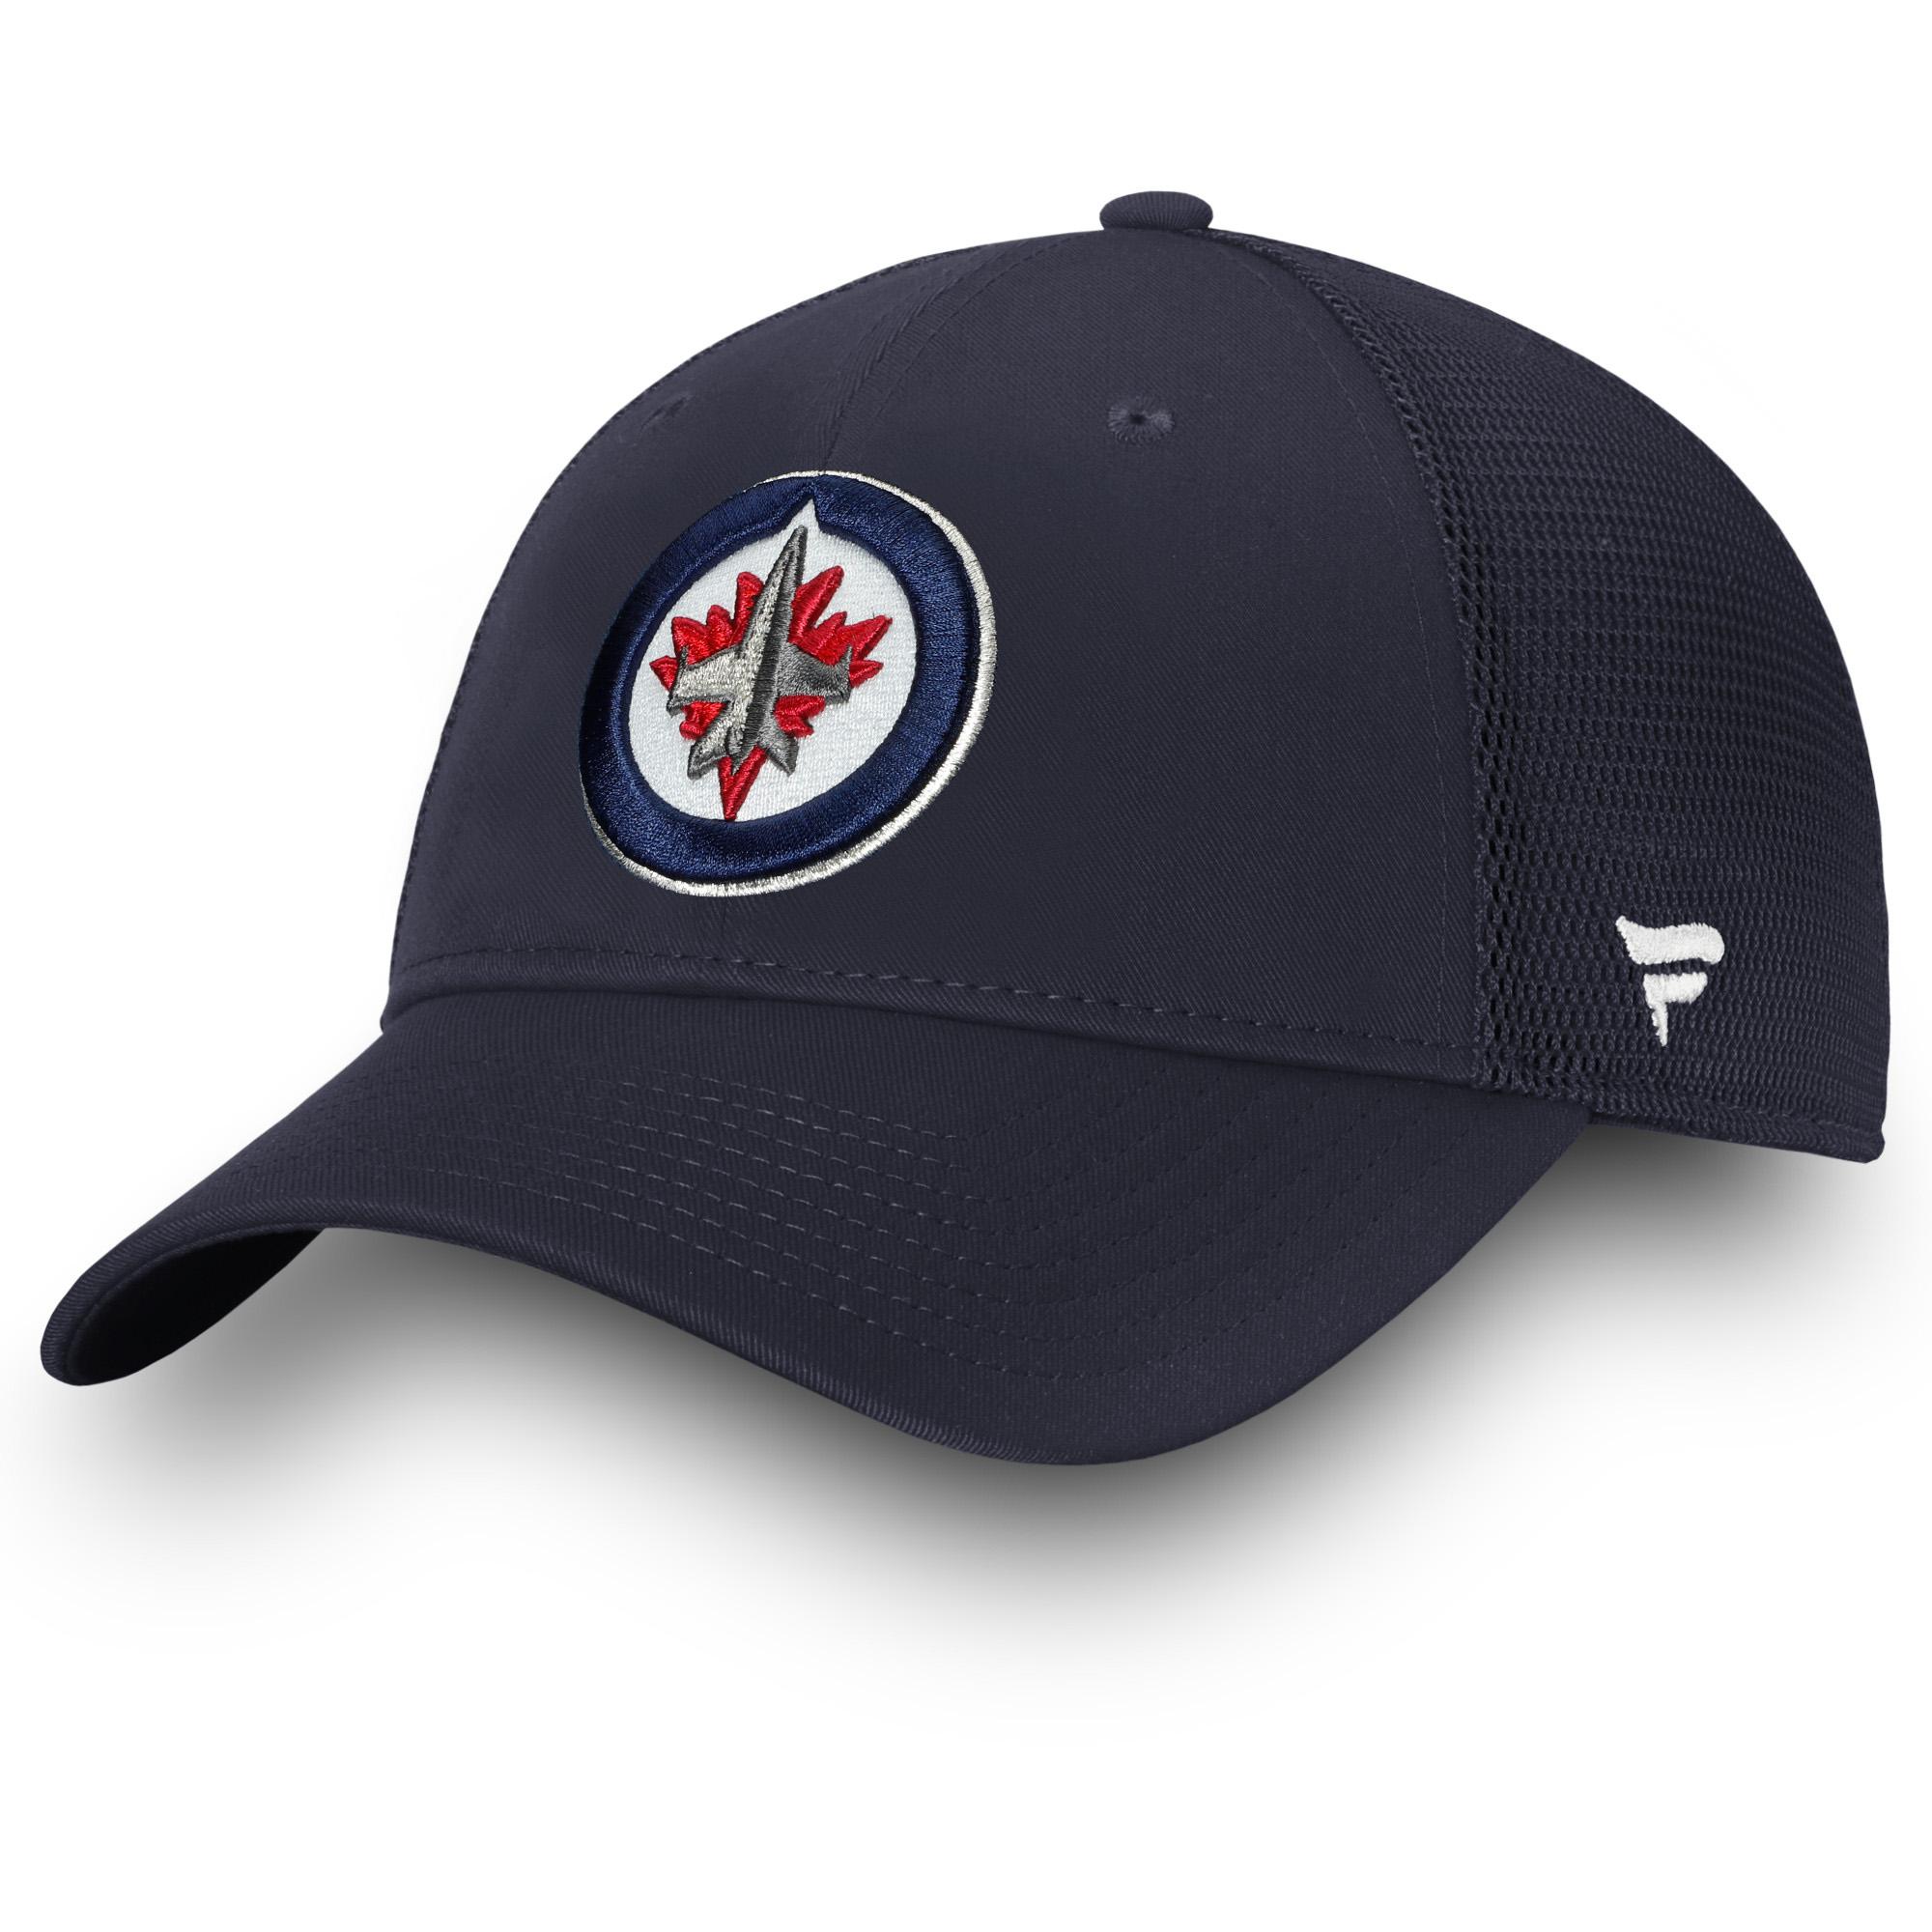 Winnipeg Jets Fanatics Branded Elevated Core Trucker Adjustable Snapback Hat - Navy - OSFA